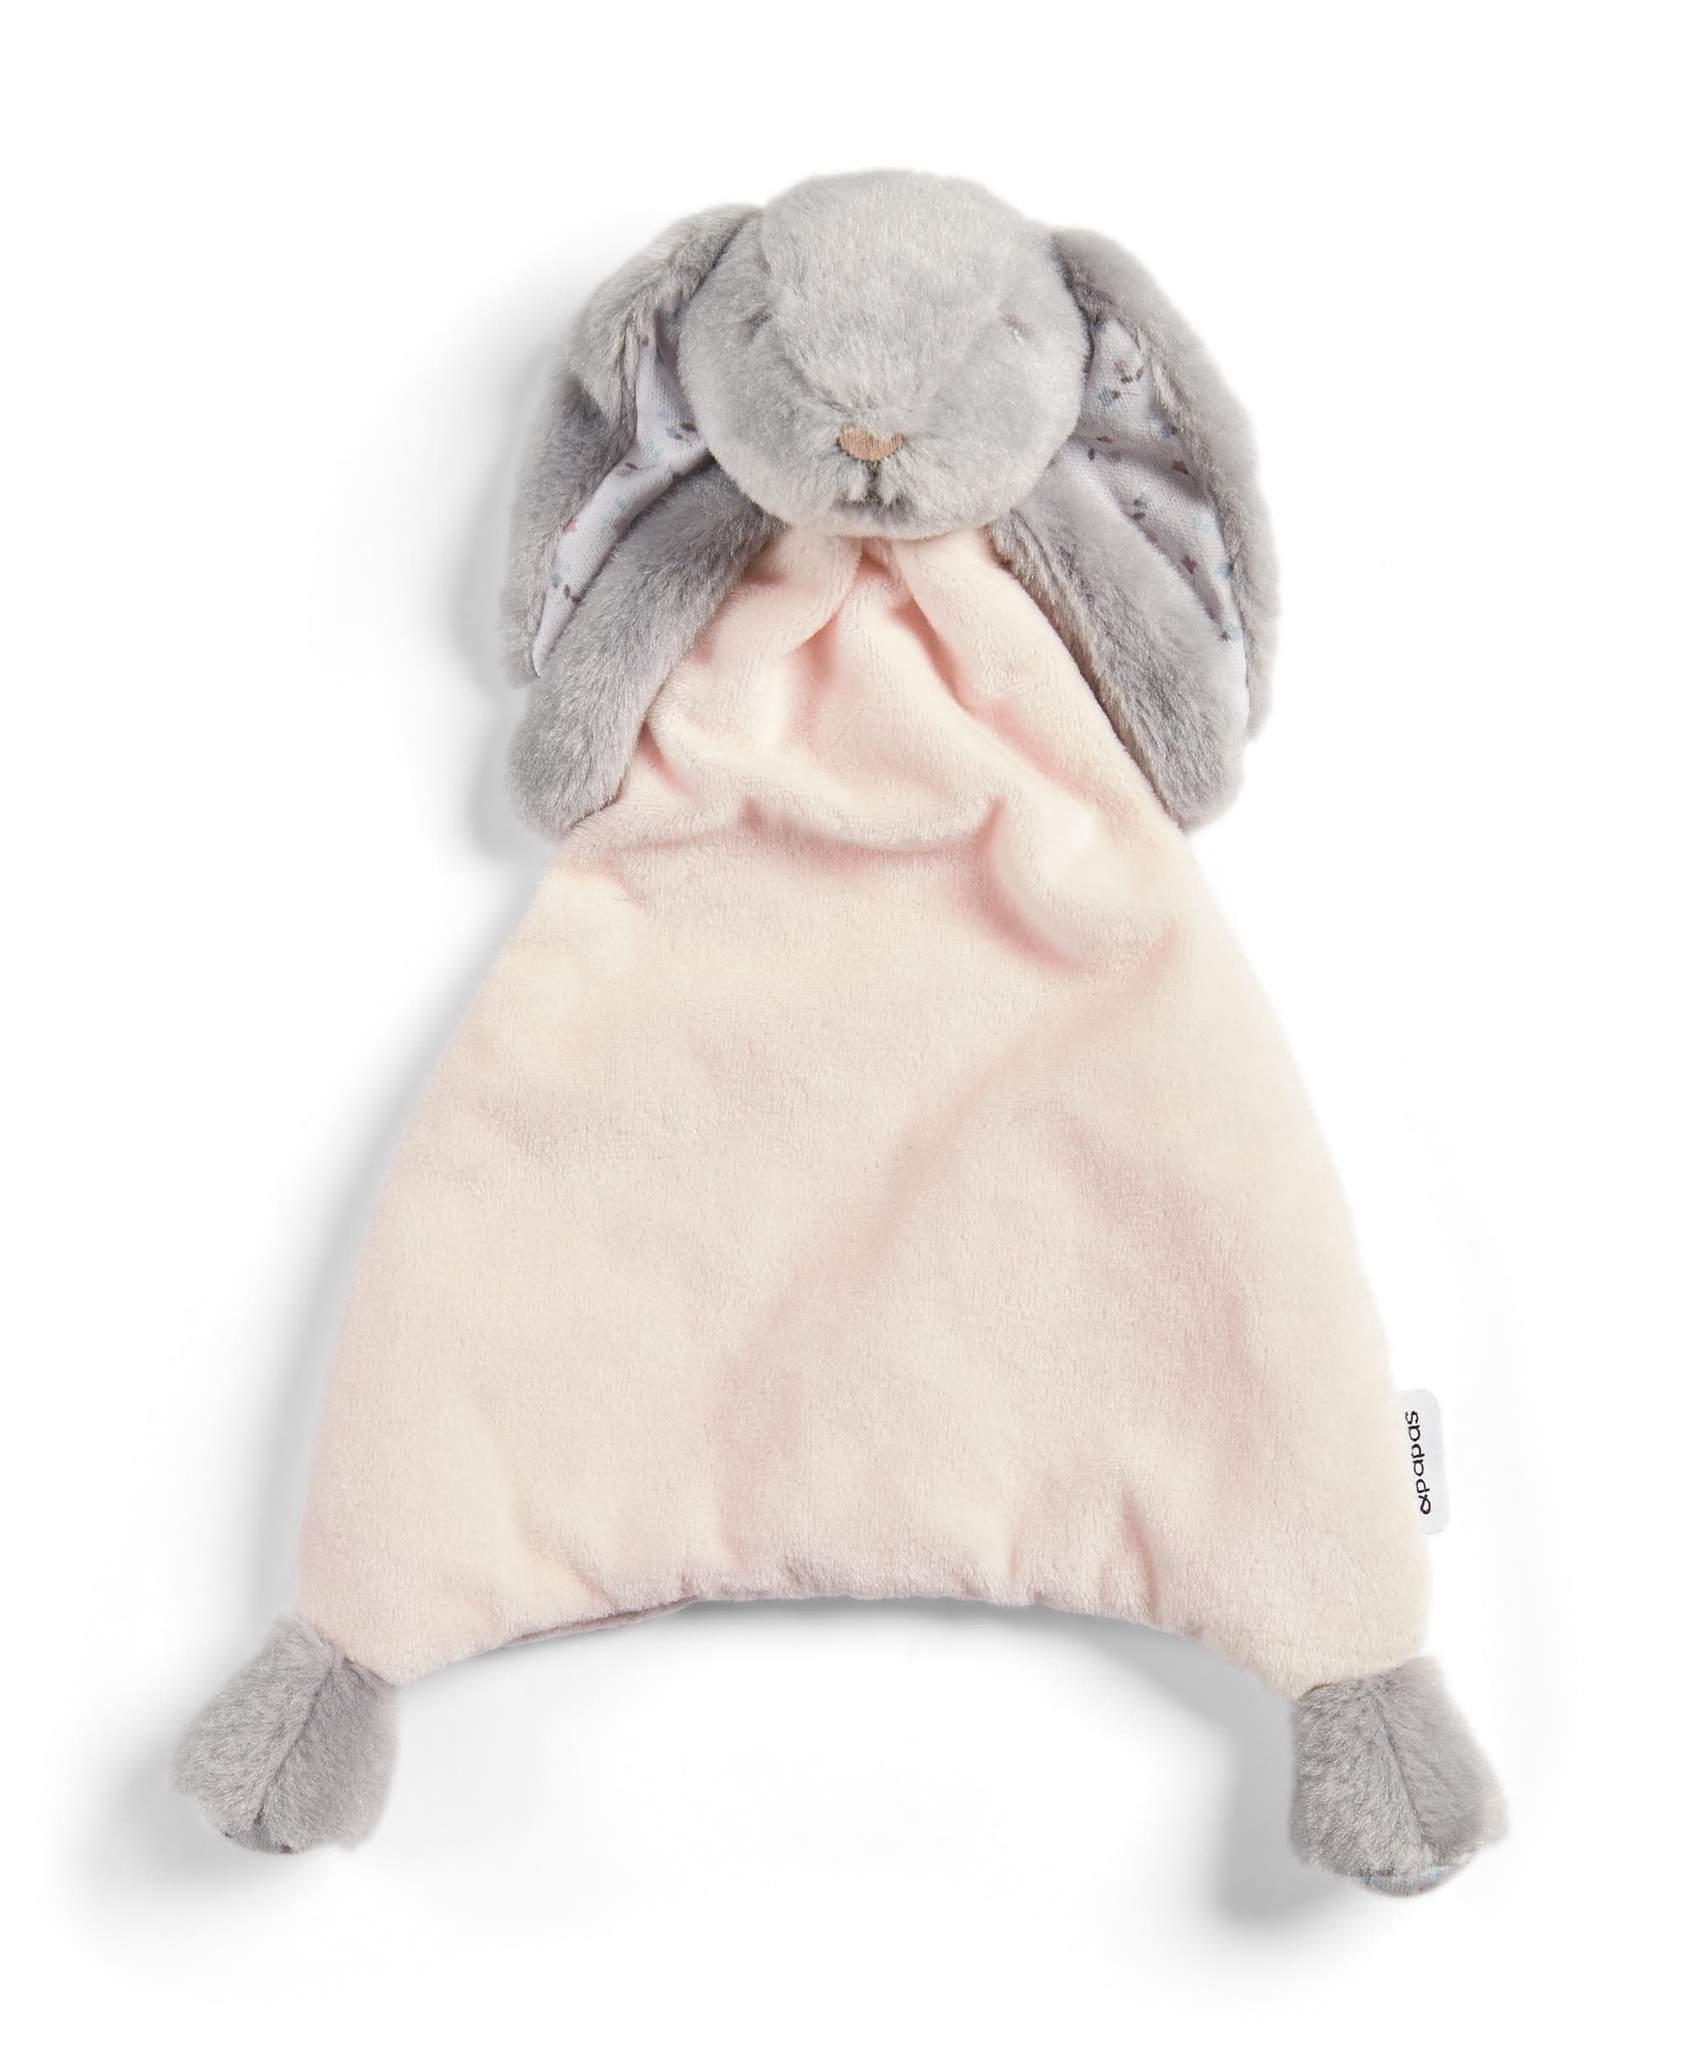 Maznáčik králik Welcome to the World Comforter